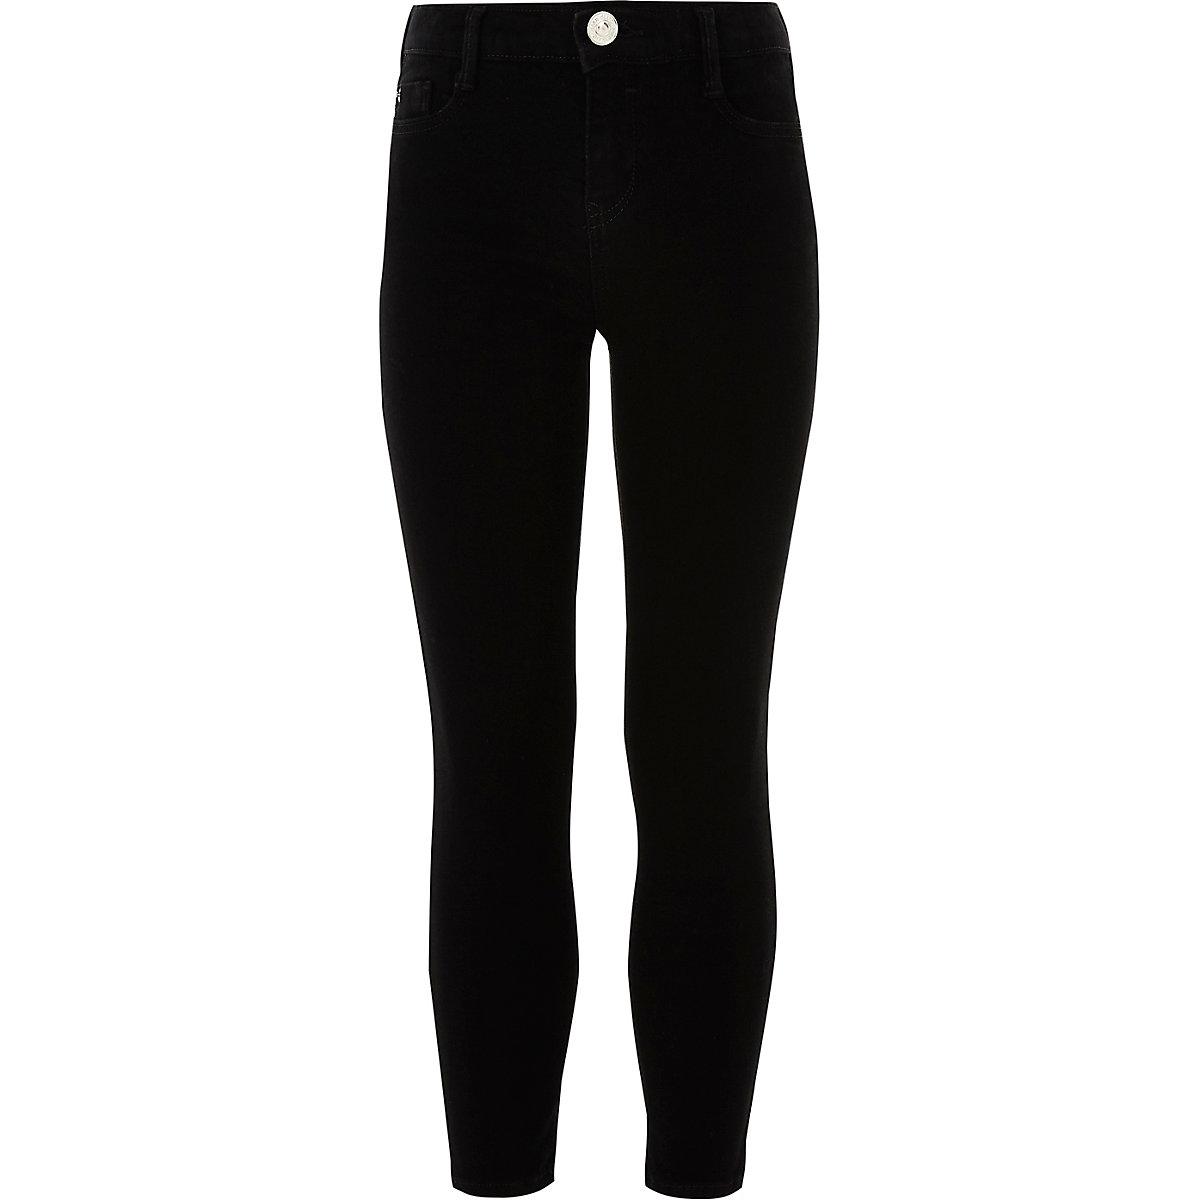 Girls black Alannah relaxed skinny jeans